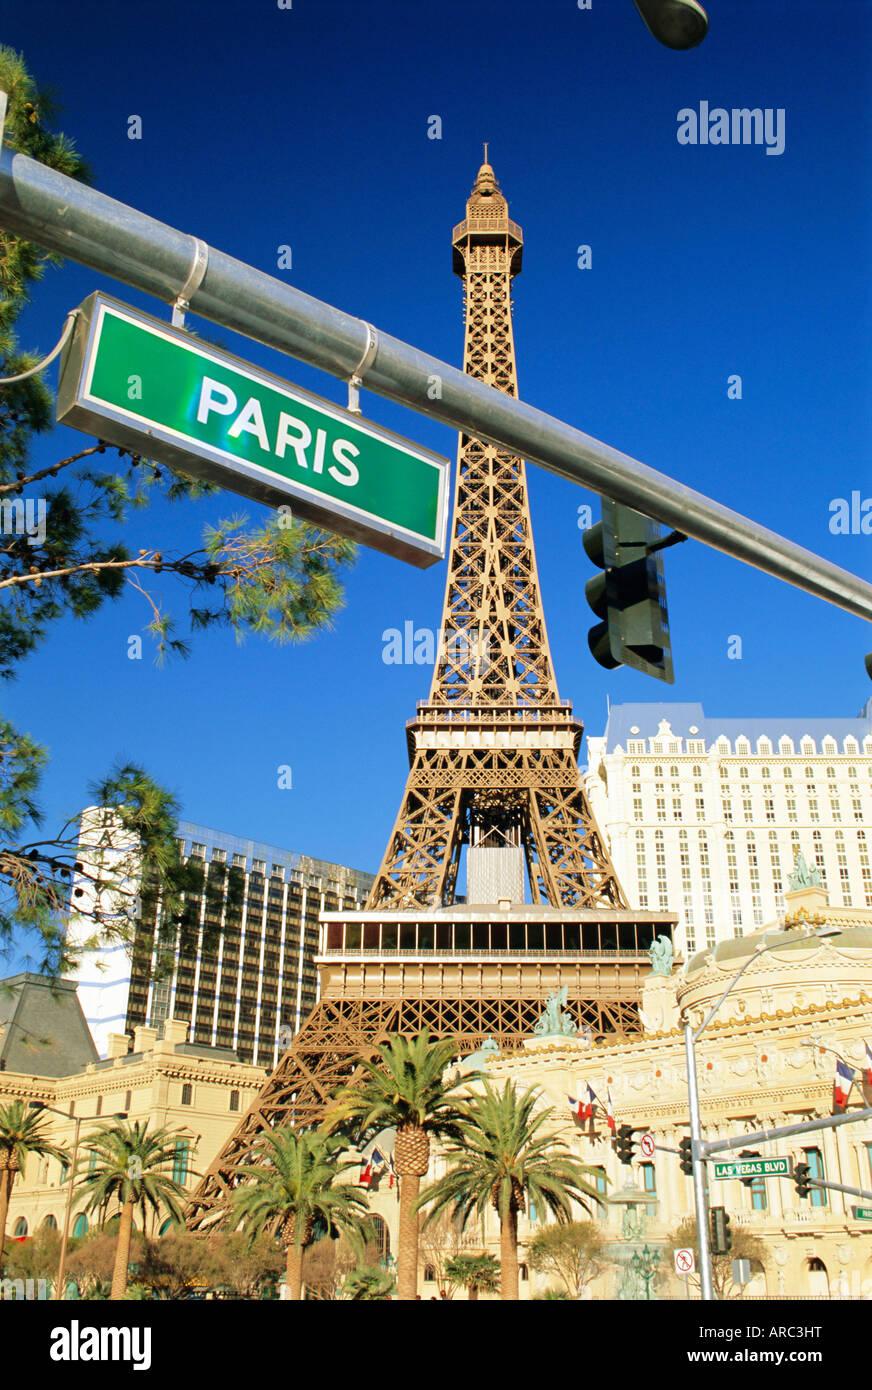 Mock Eiffel tower, Paris, Las Vegas, Nevada, USA, North America - Stock Image